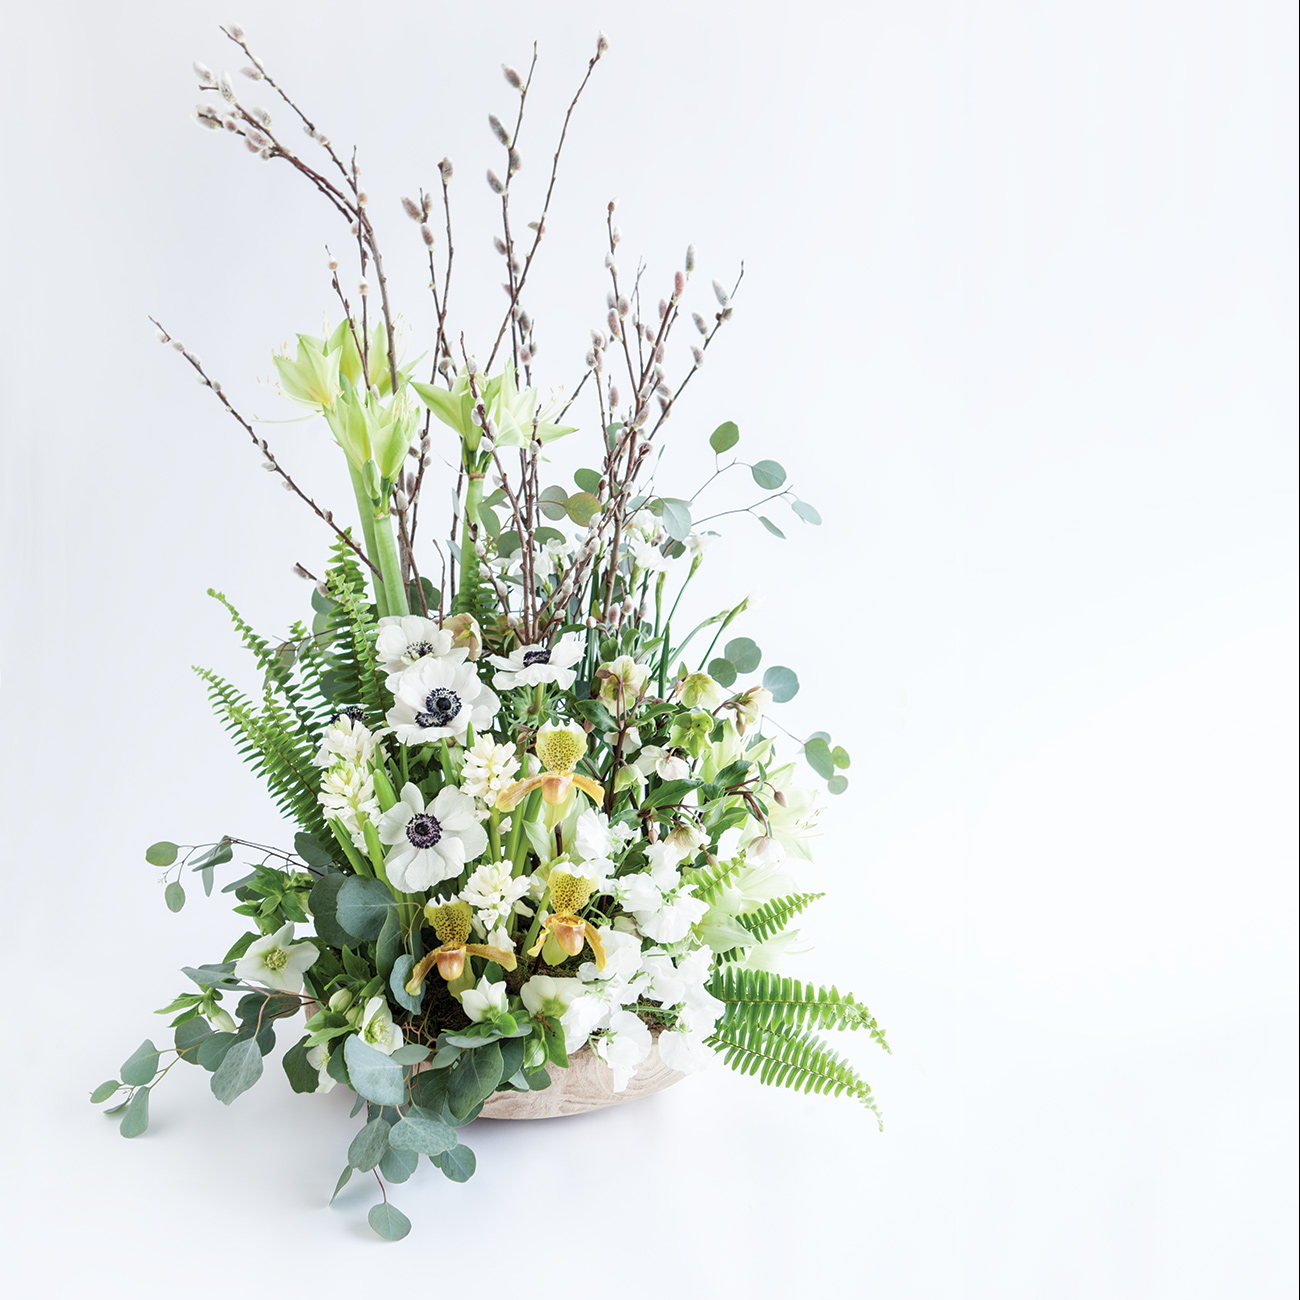 Garden-Inspired Floral Design